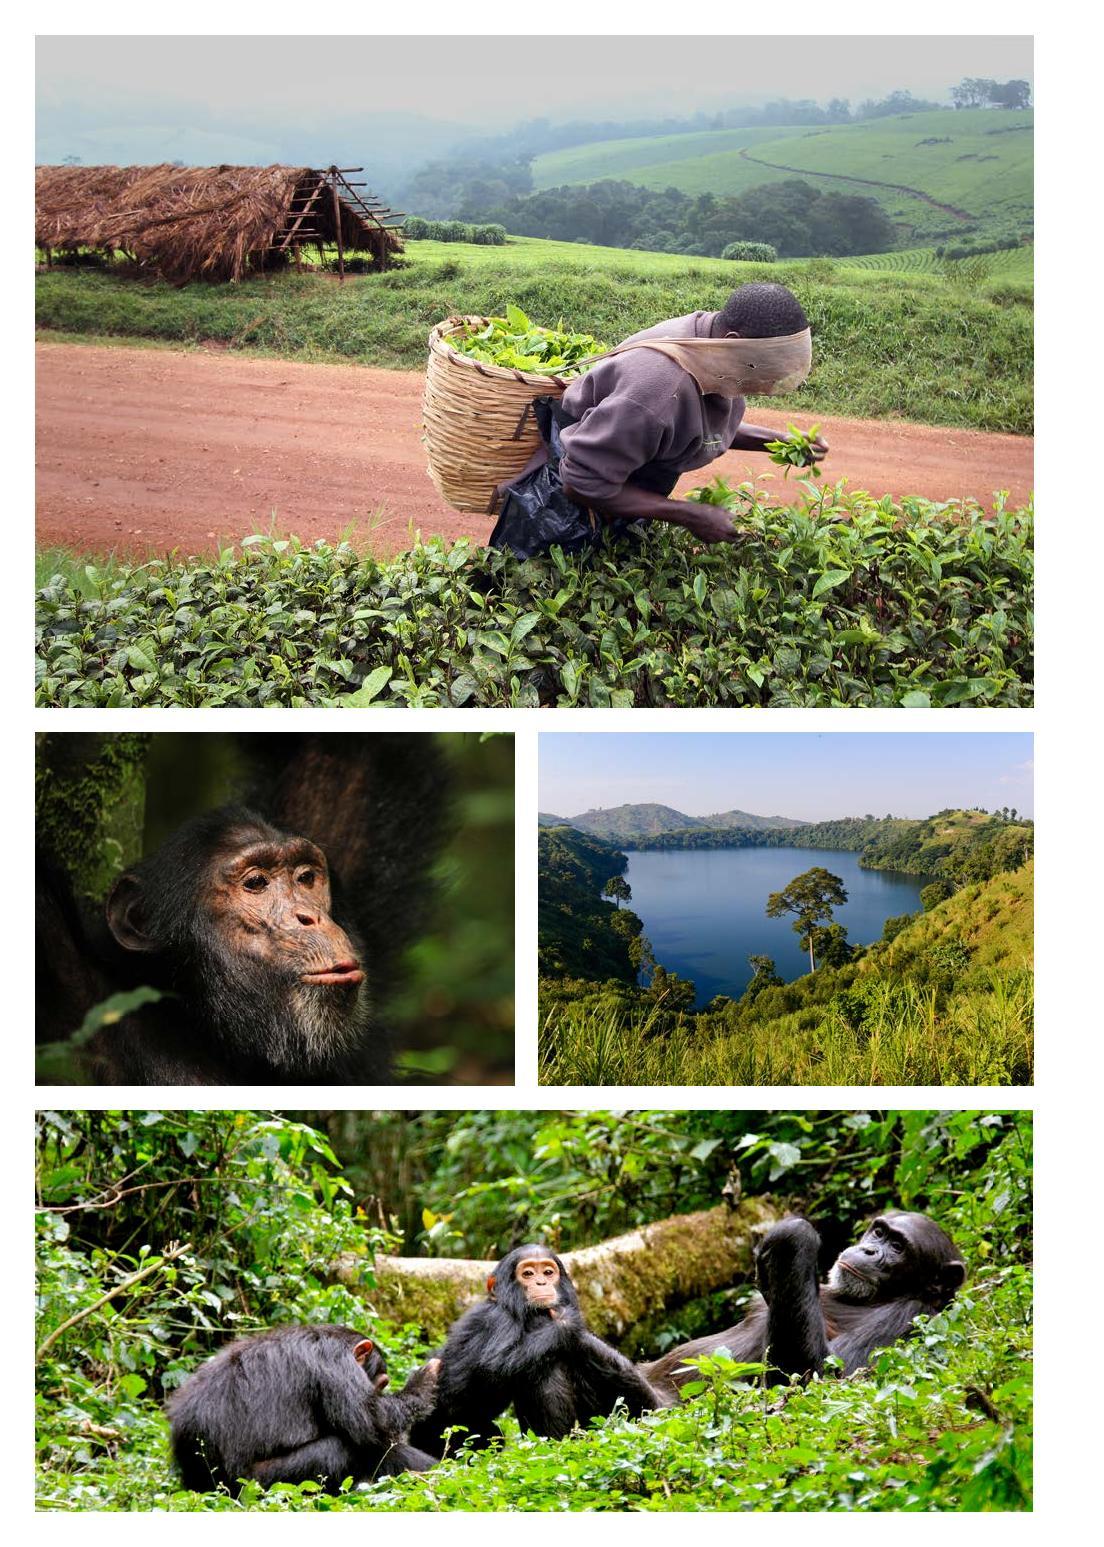 KO1604_Uganda_Simpanzi_JS-page-005